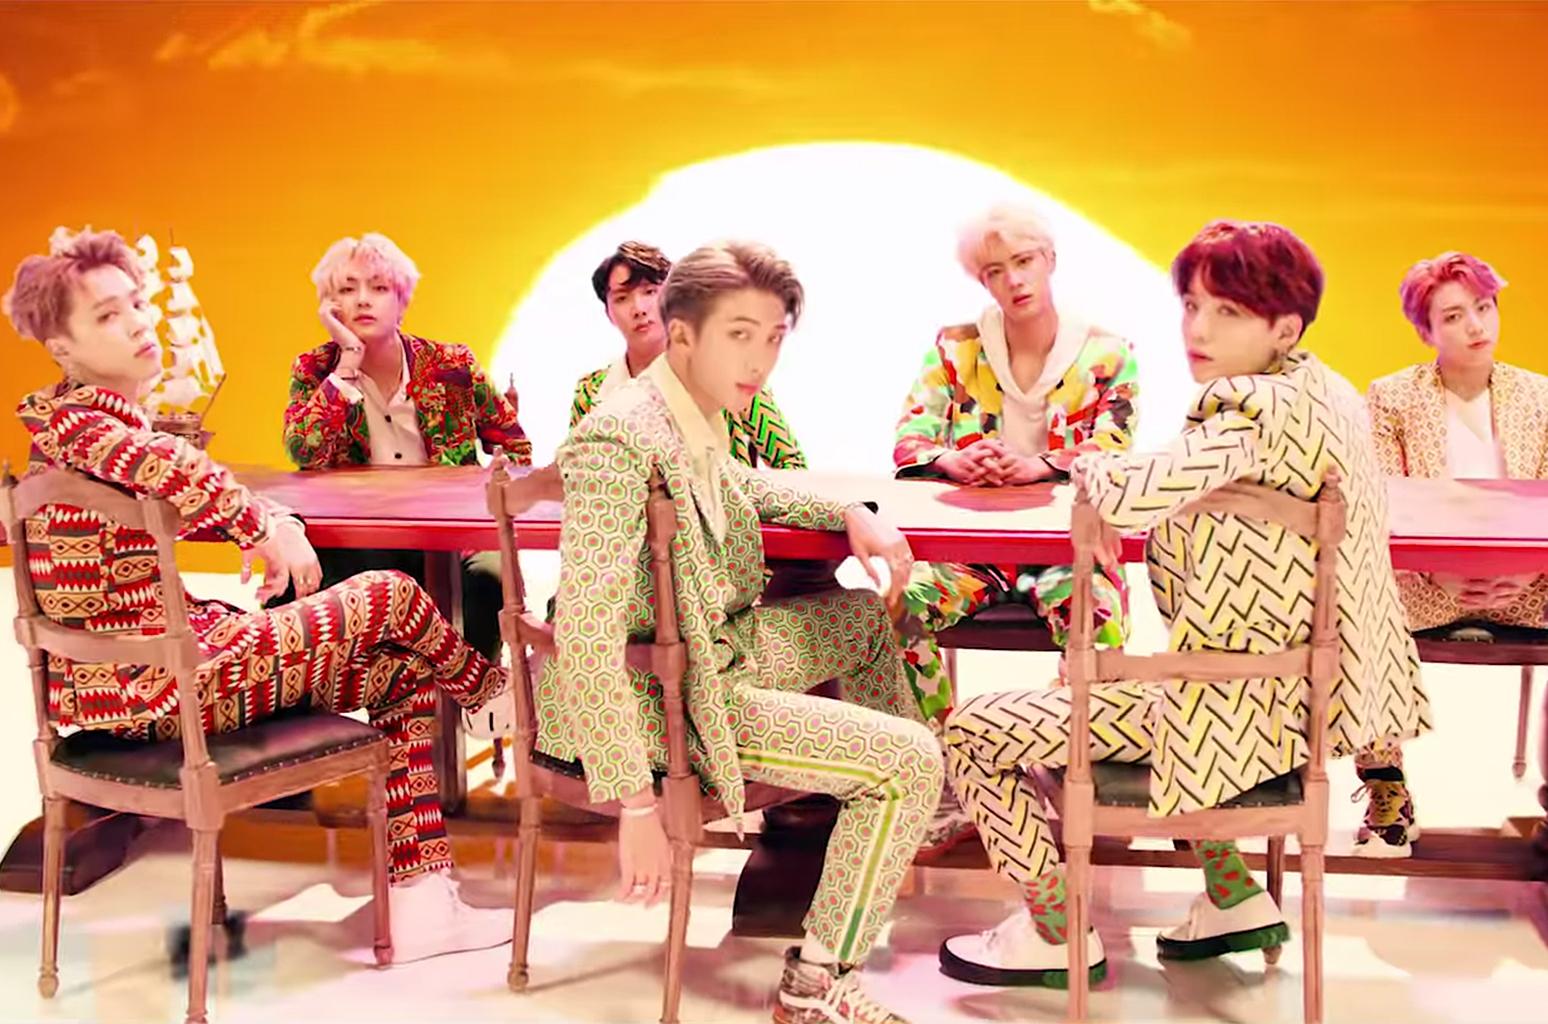 BTS' 'Idol' Music Video is Fastest to Reach 100M Views In 2018 | Billboard